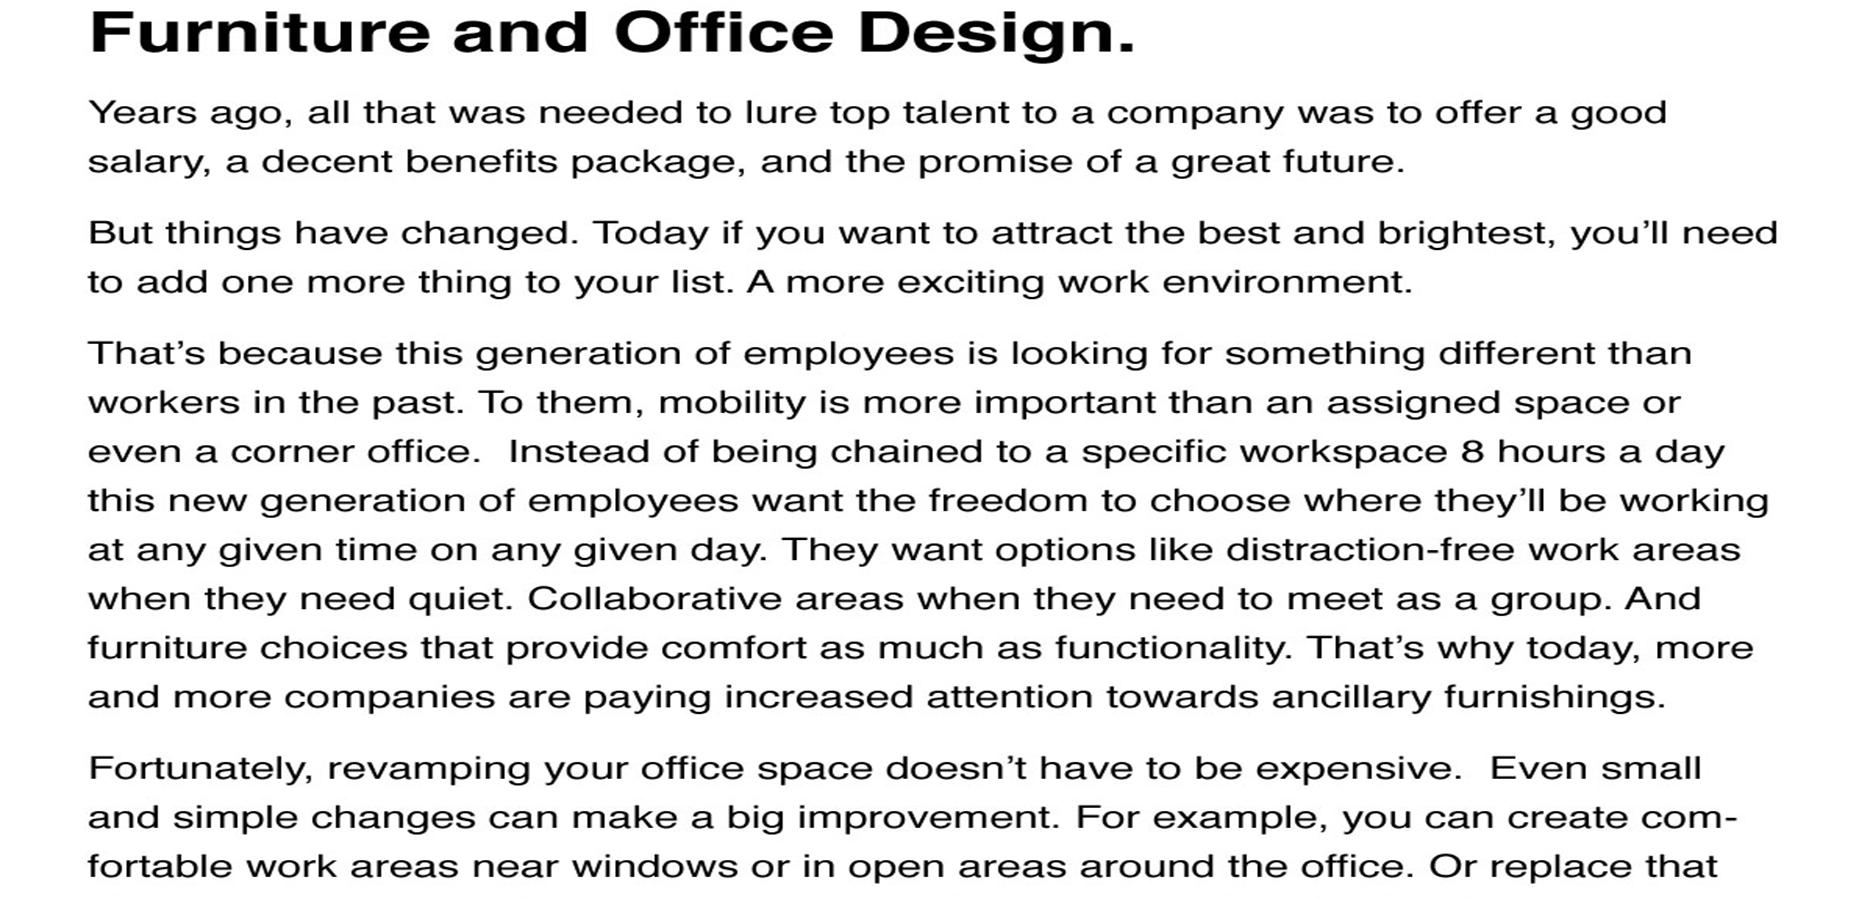 FurnitureandOfficeDesign1.jpg.png